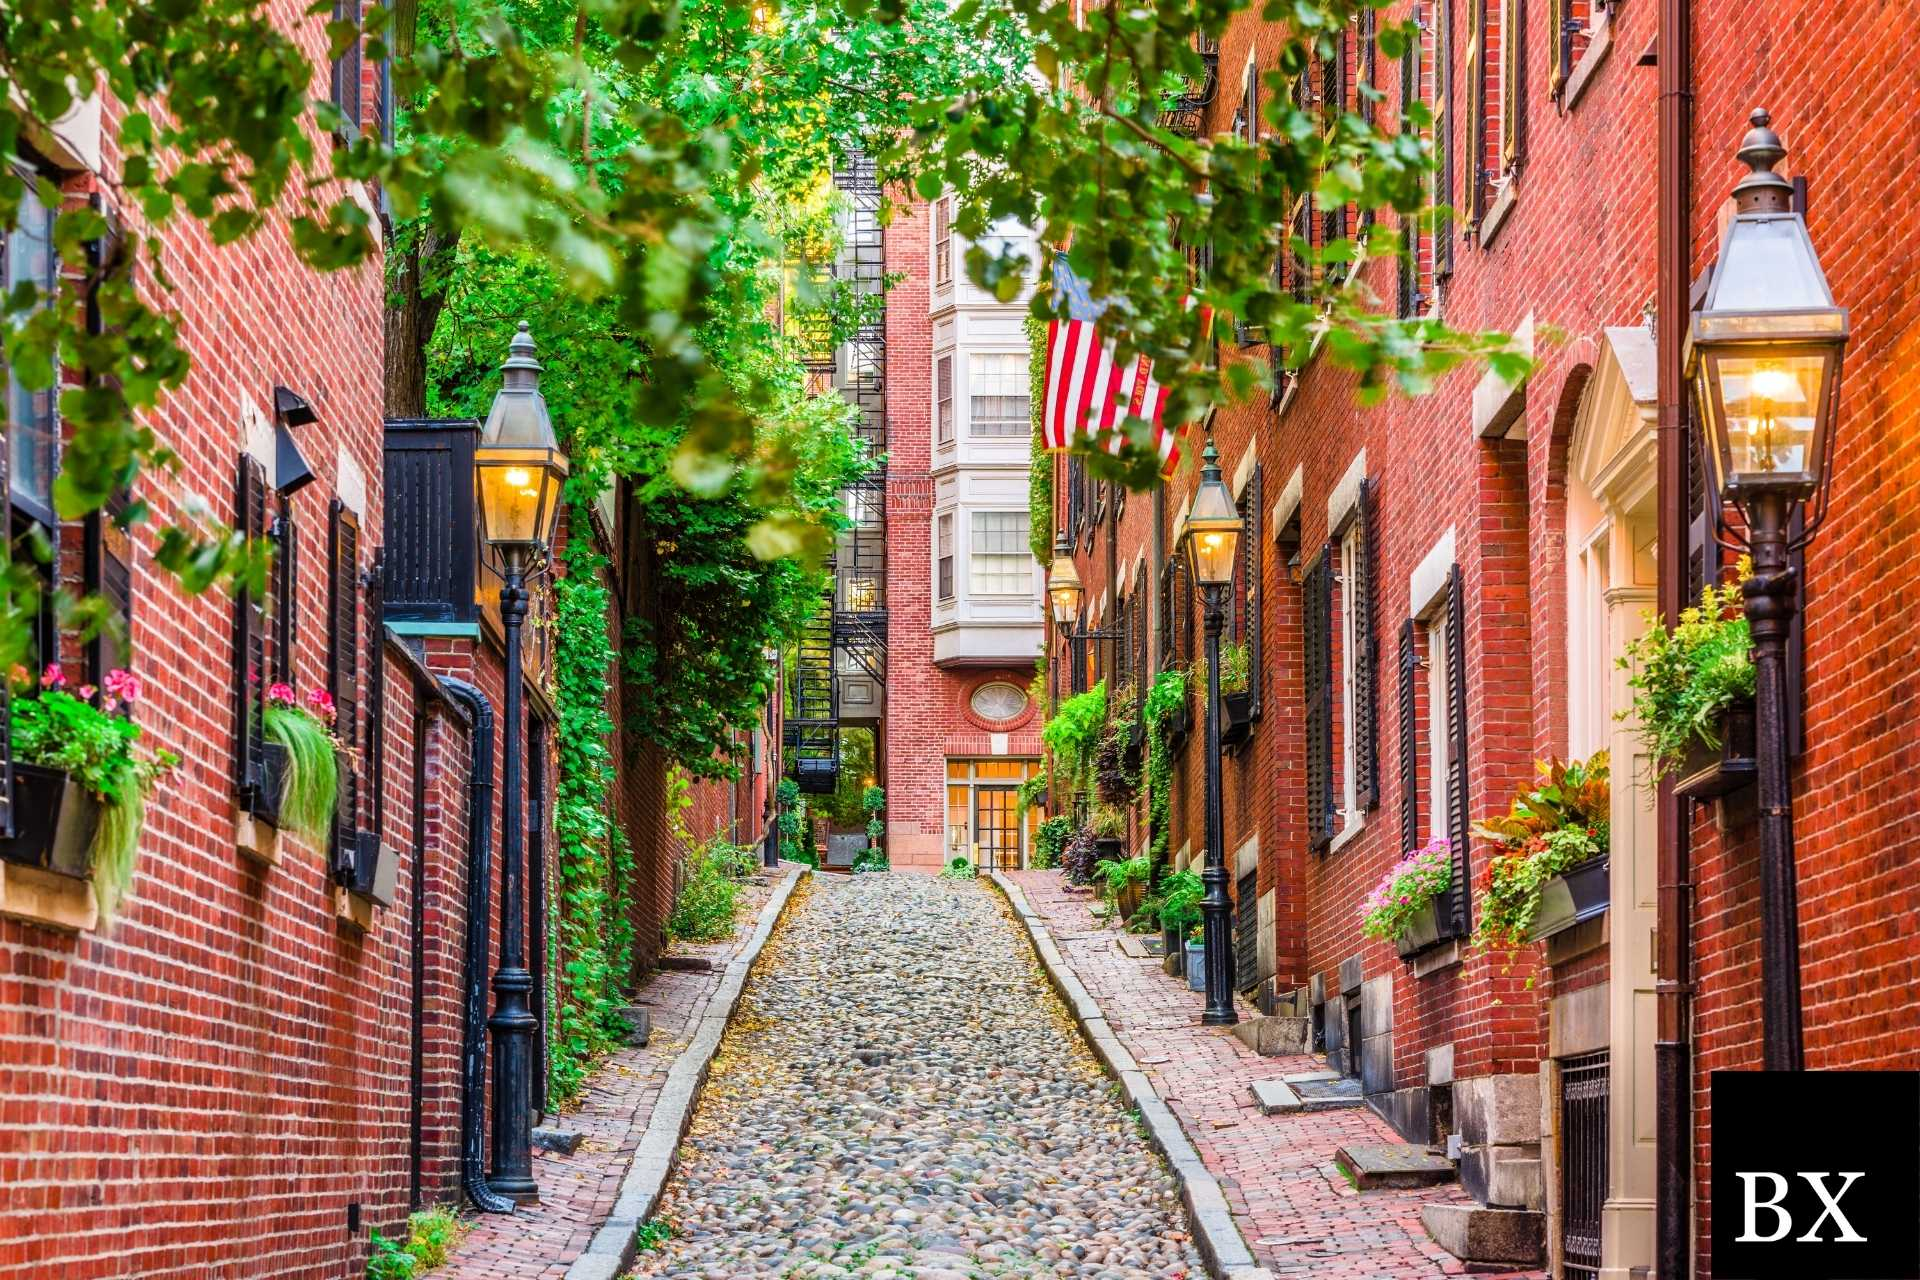 Massachusetts Mortgage Loan Originator Bond